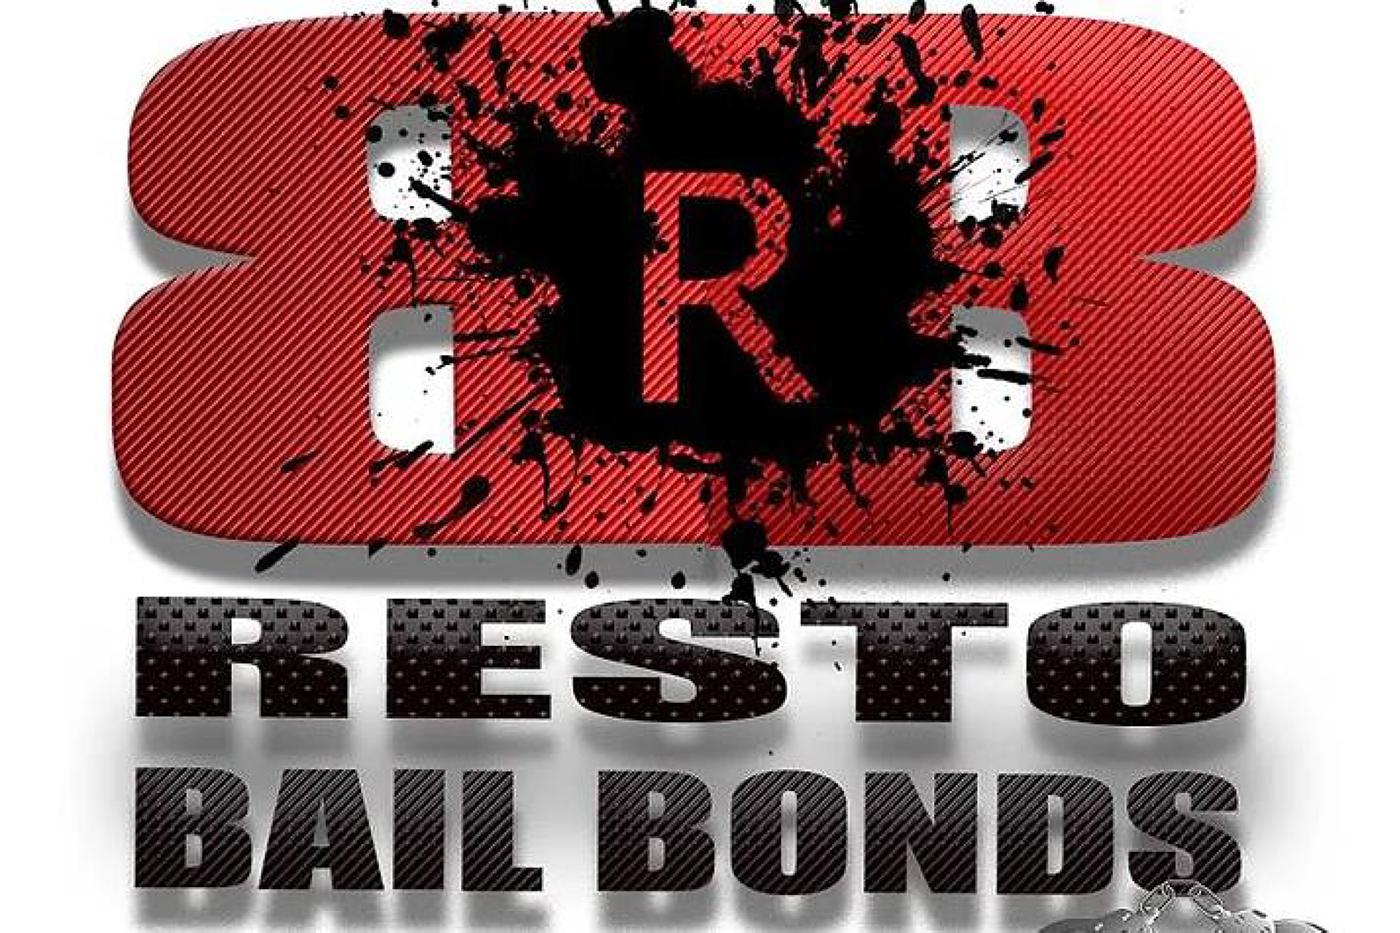 resto bail bonds logo